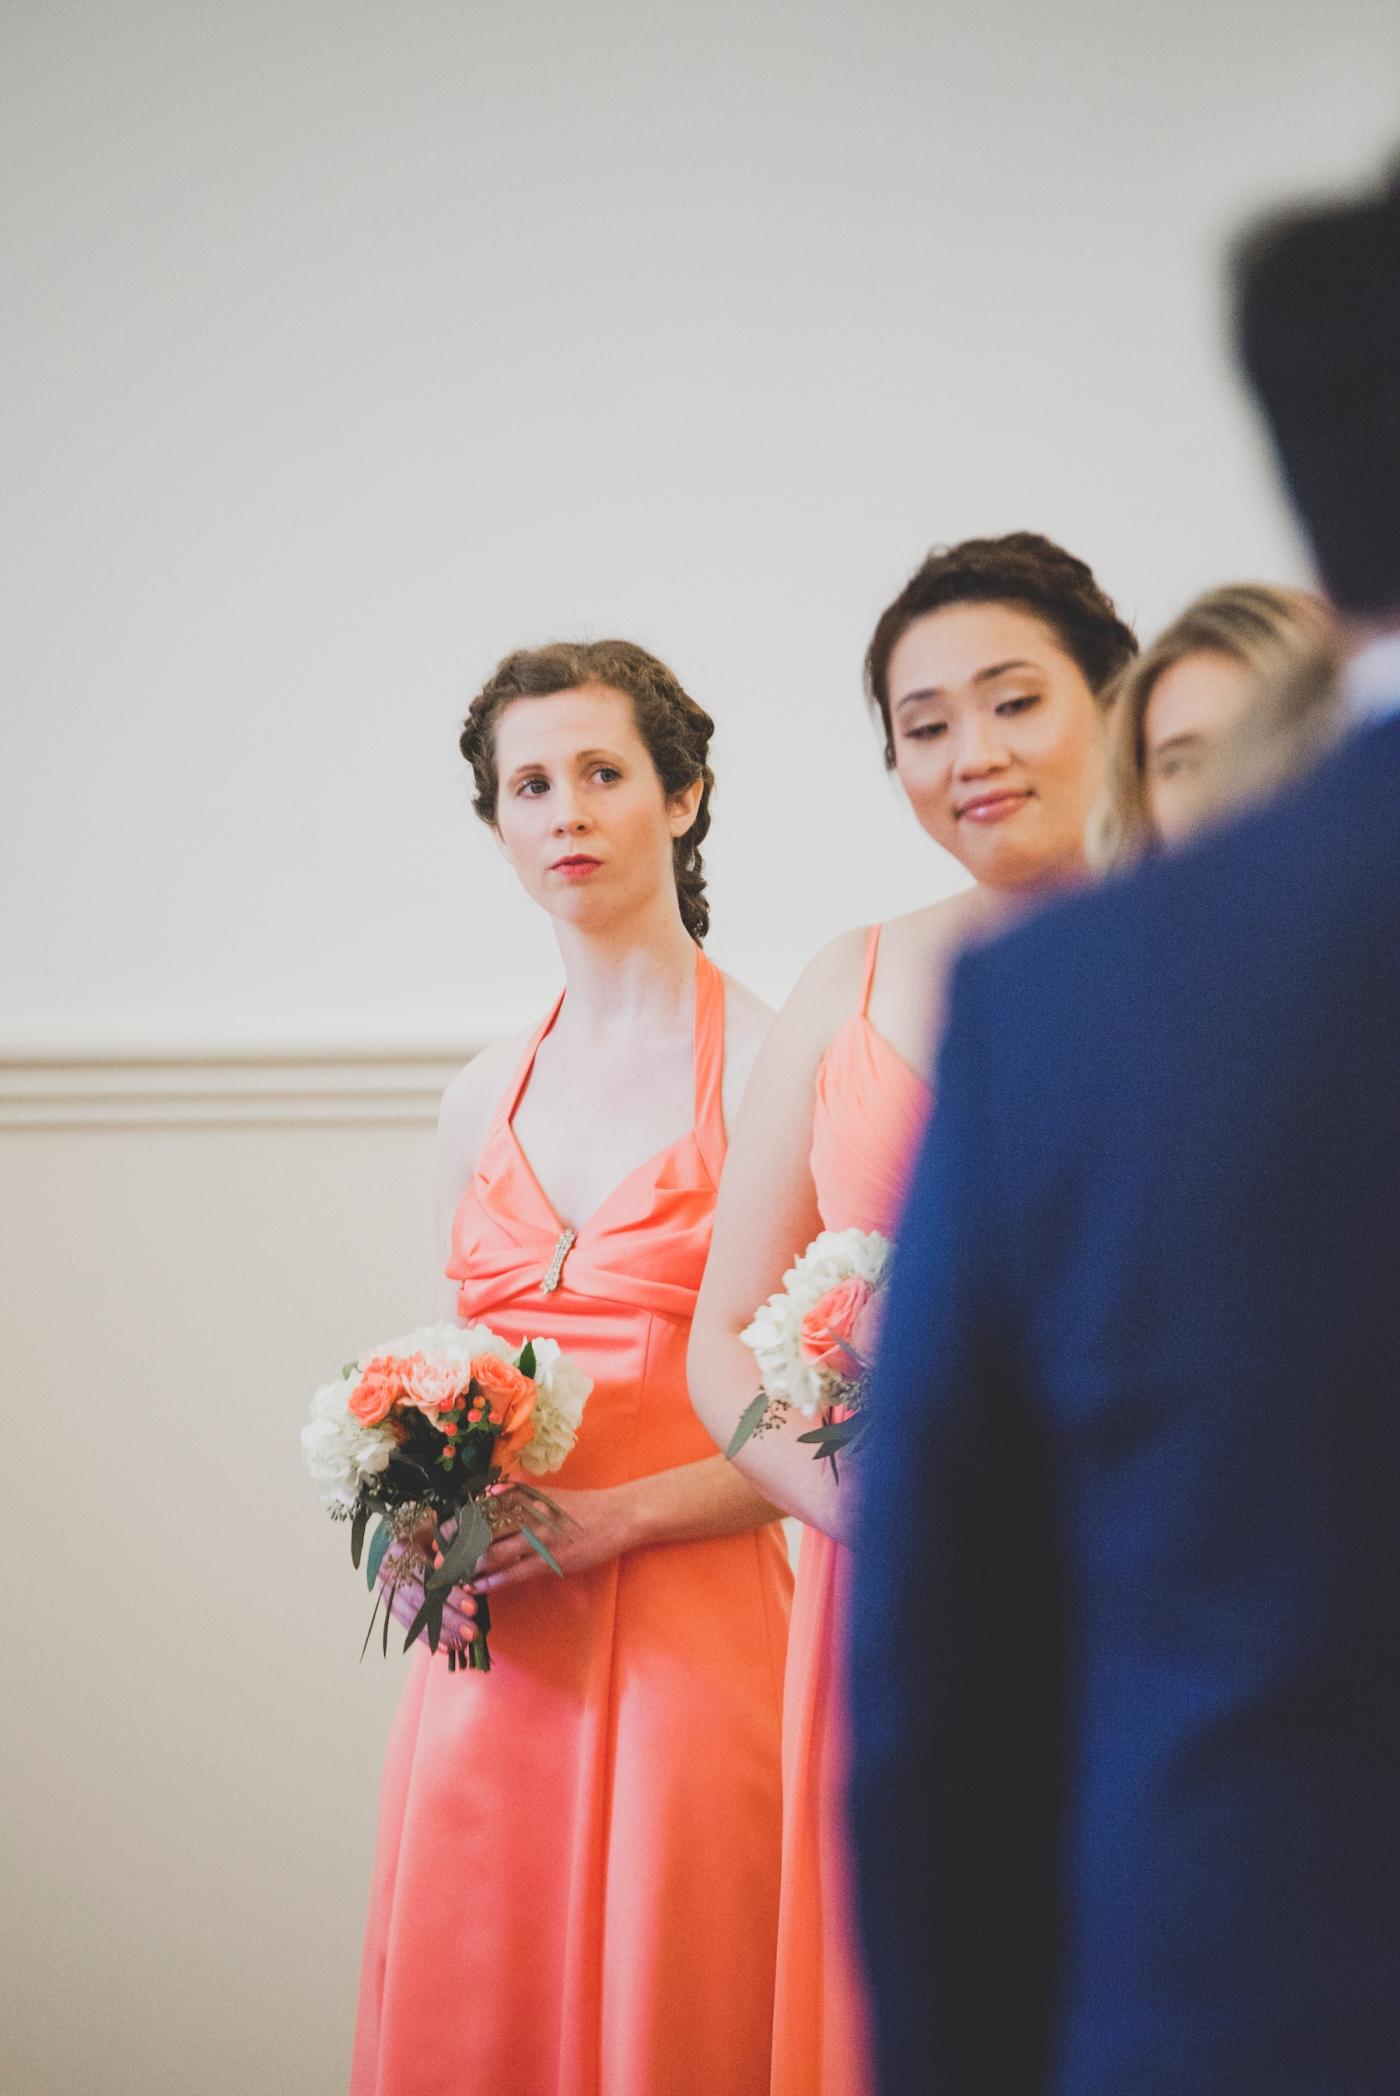 DSC_2626Everett_Wedding_Ballroom_Jane_Speleers_photography_Rachel_and_Edmund_Ceremony_2017